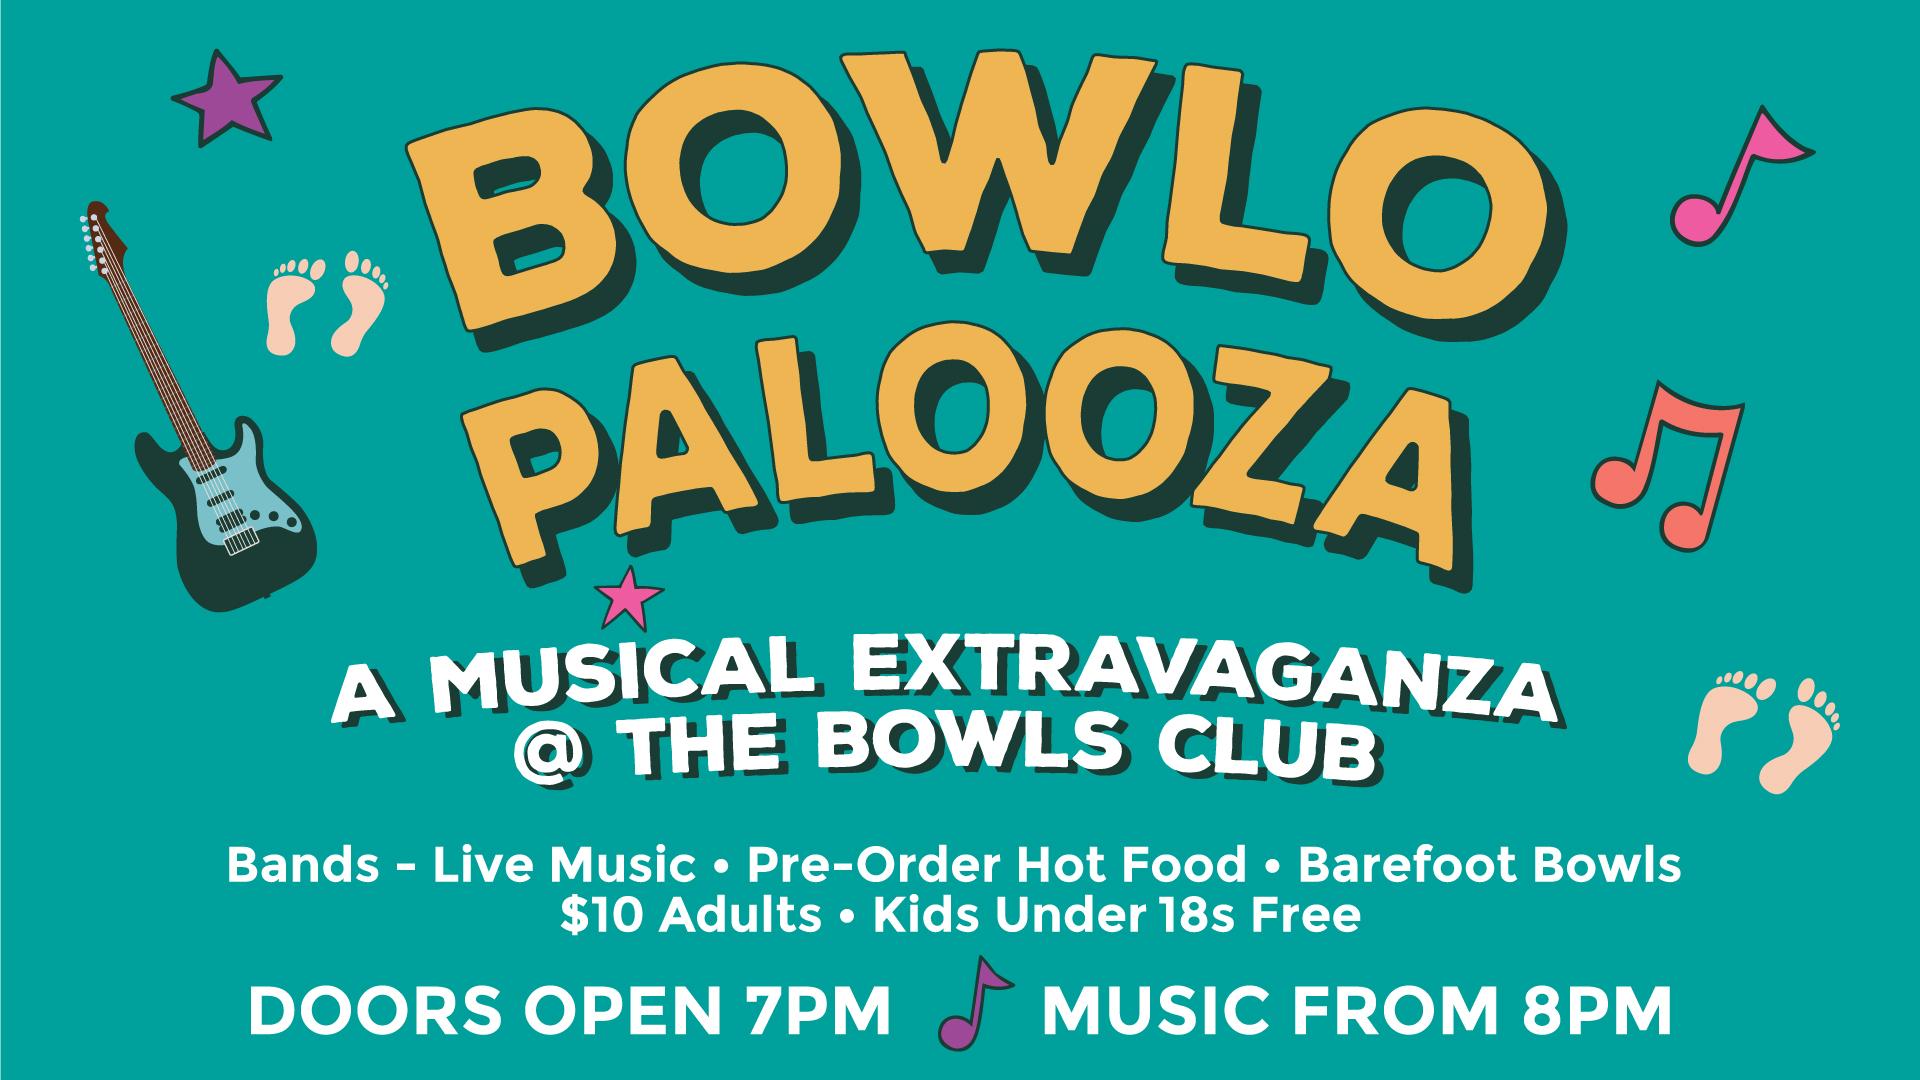 Bowlo Palooza - A musical extravaganza @ Thornbury Bowls Club